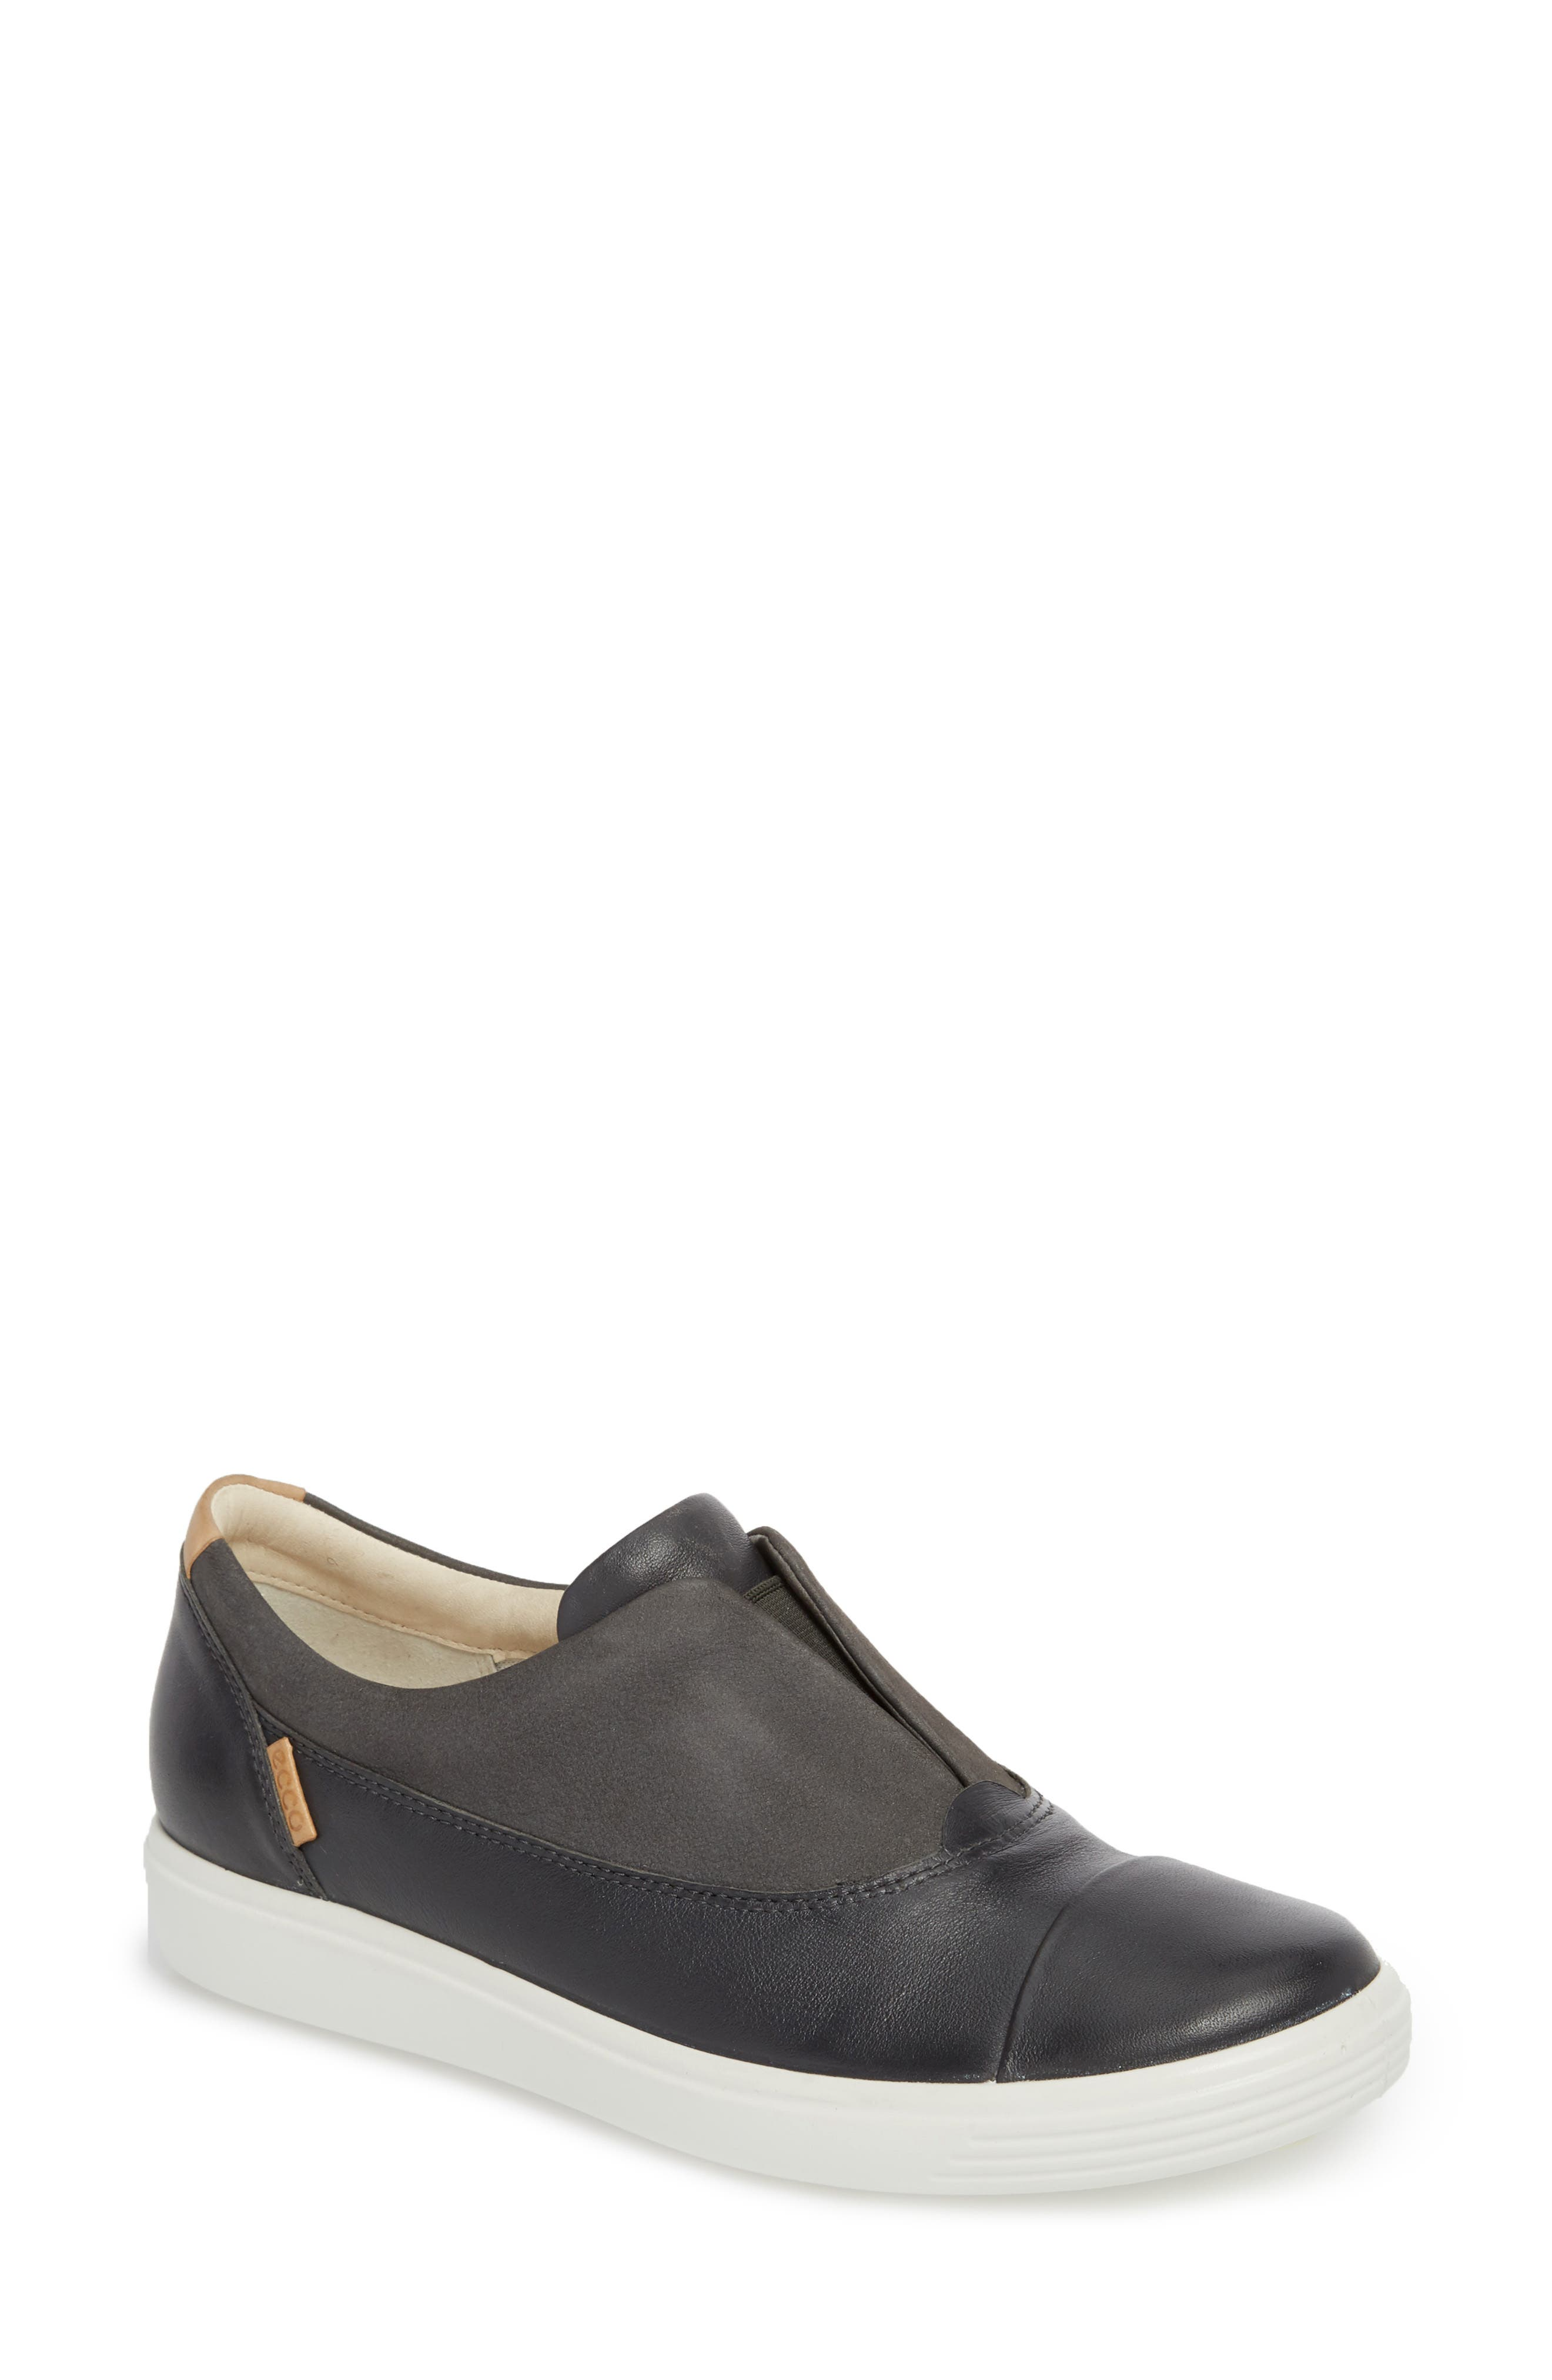 Soft 7 II Slip-On Sneaker,                             Main thumbnail 1, color,                             DARK SHADOW LEATHER